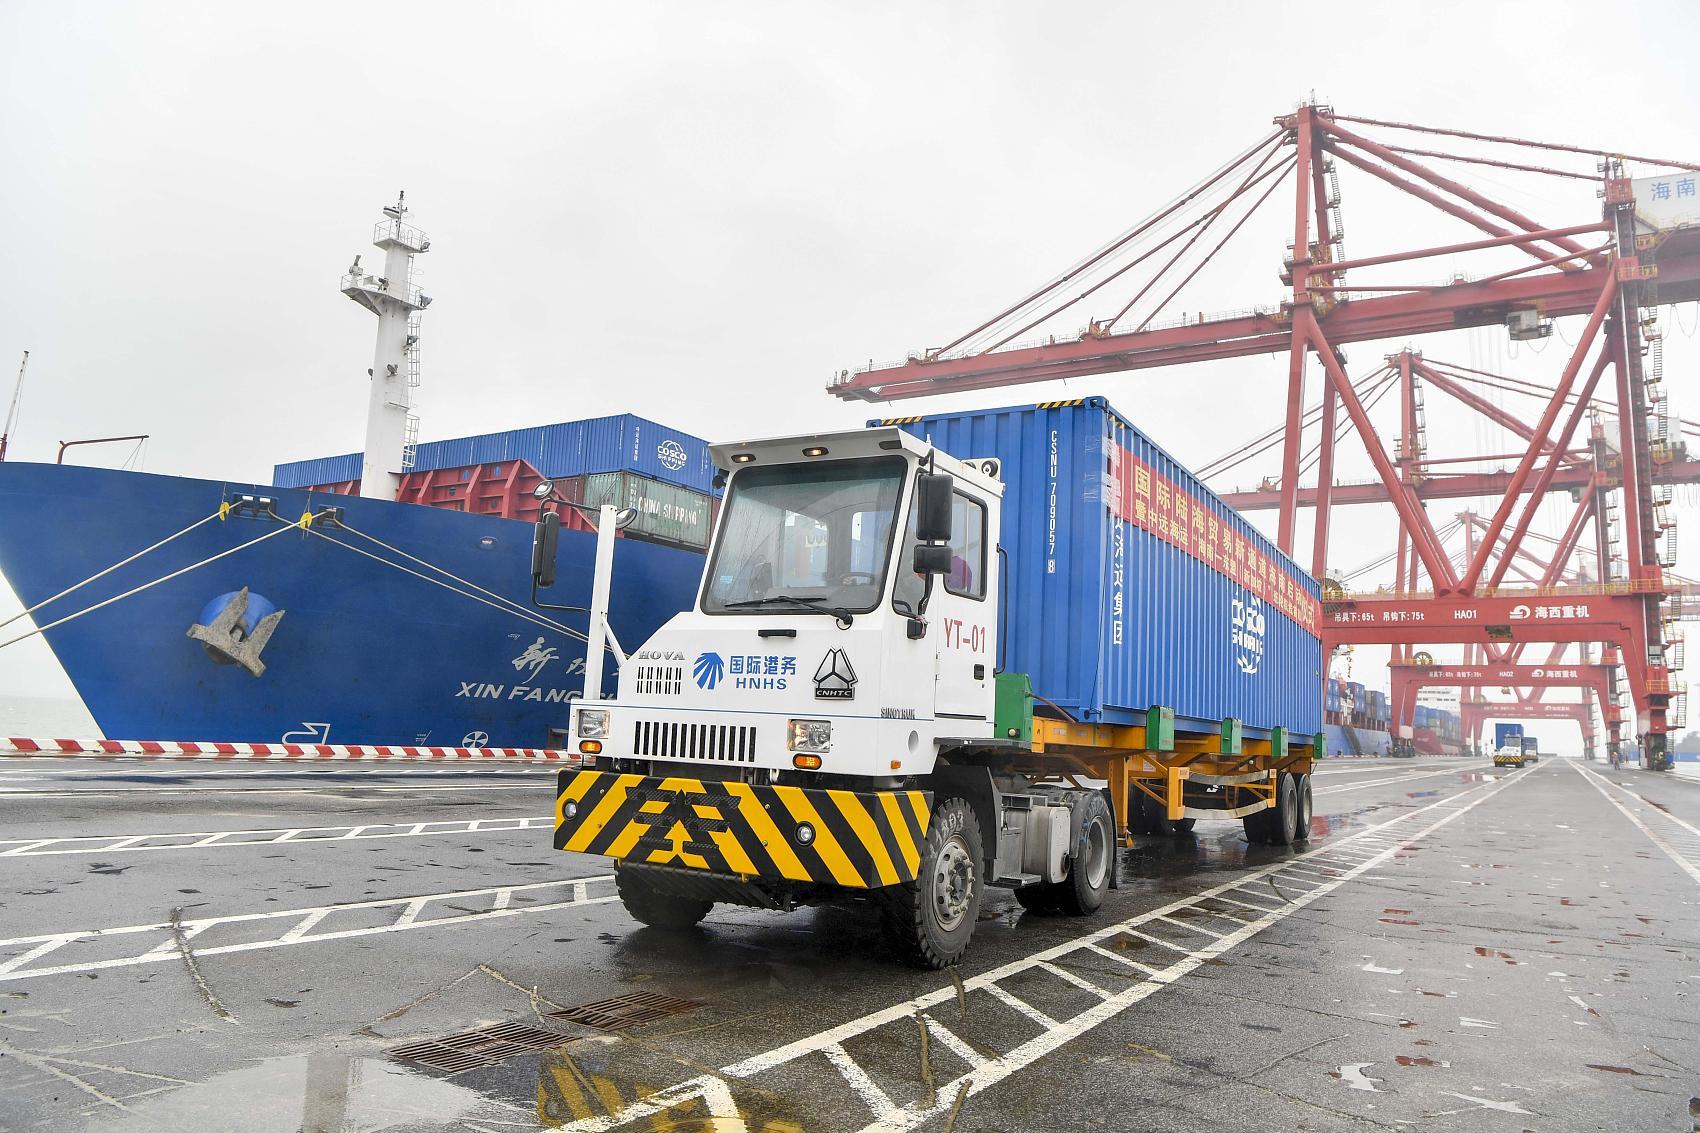 ASEAN, China's Hong Kong agree to enhance economic relations